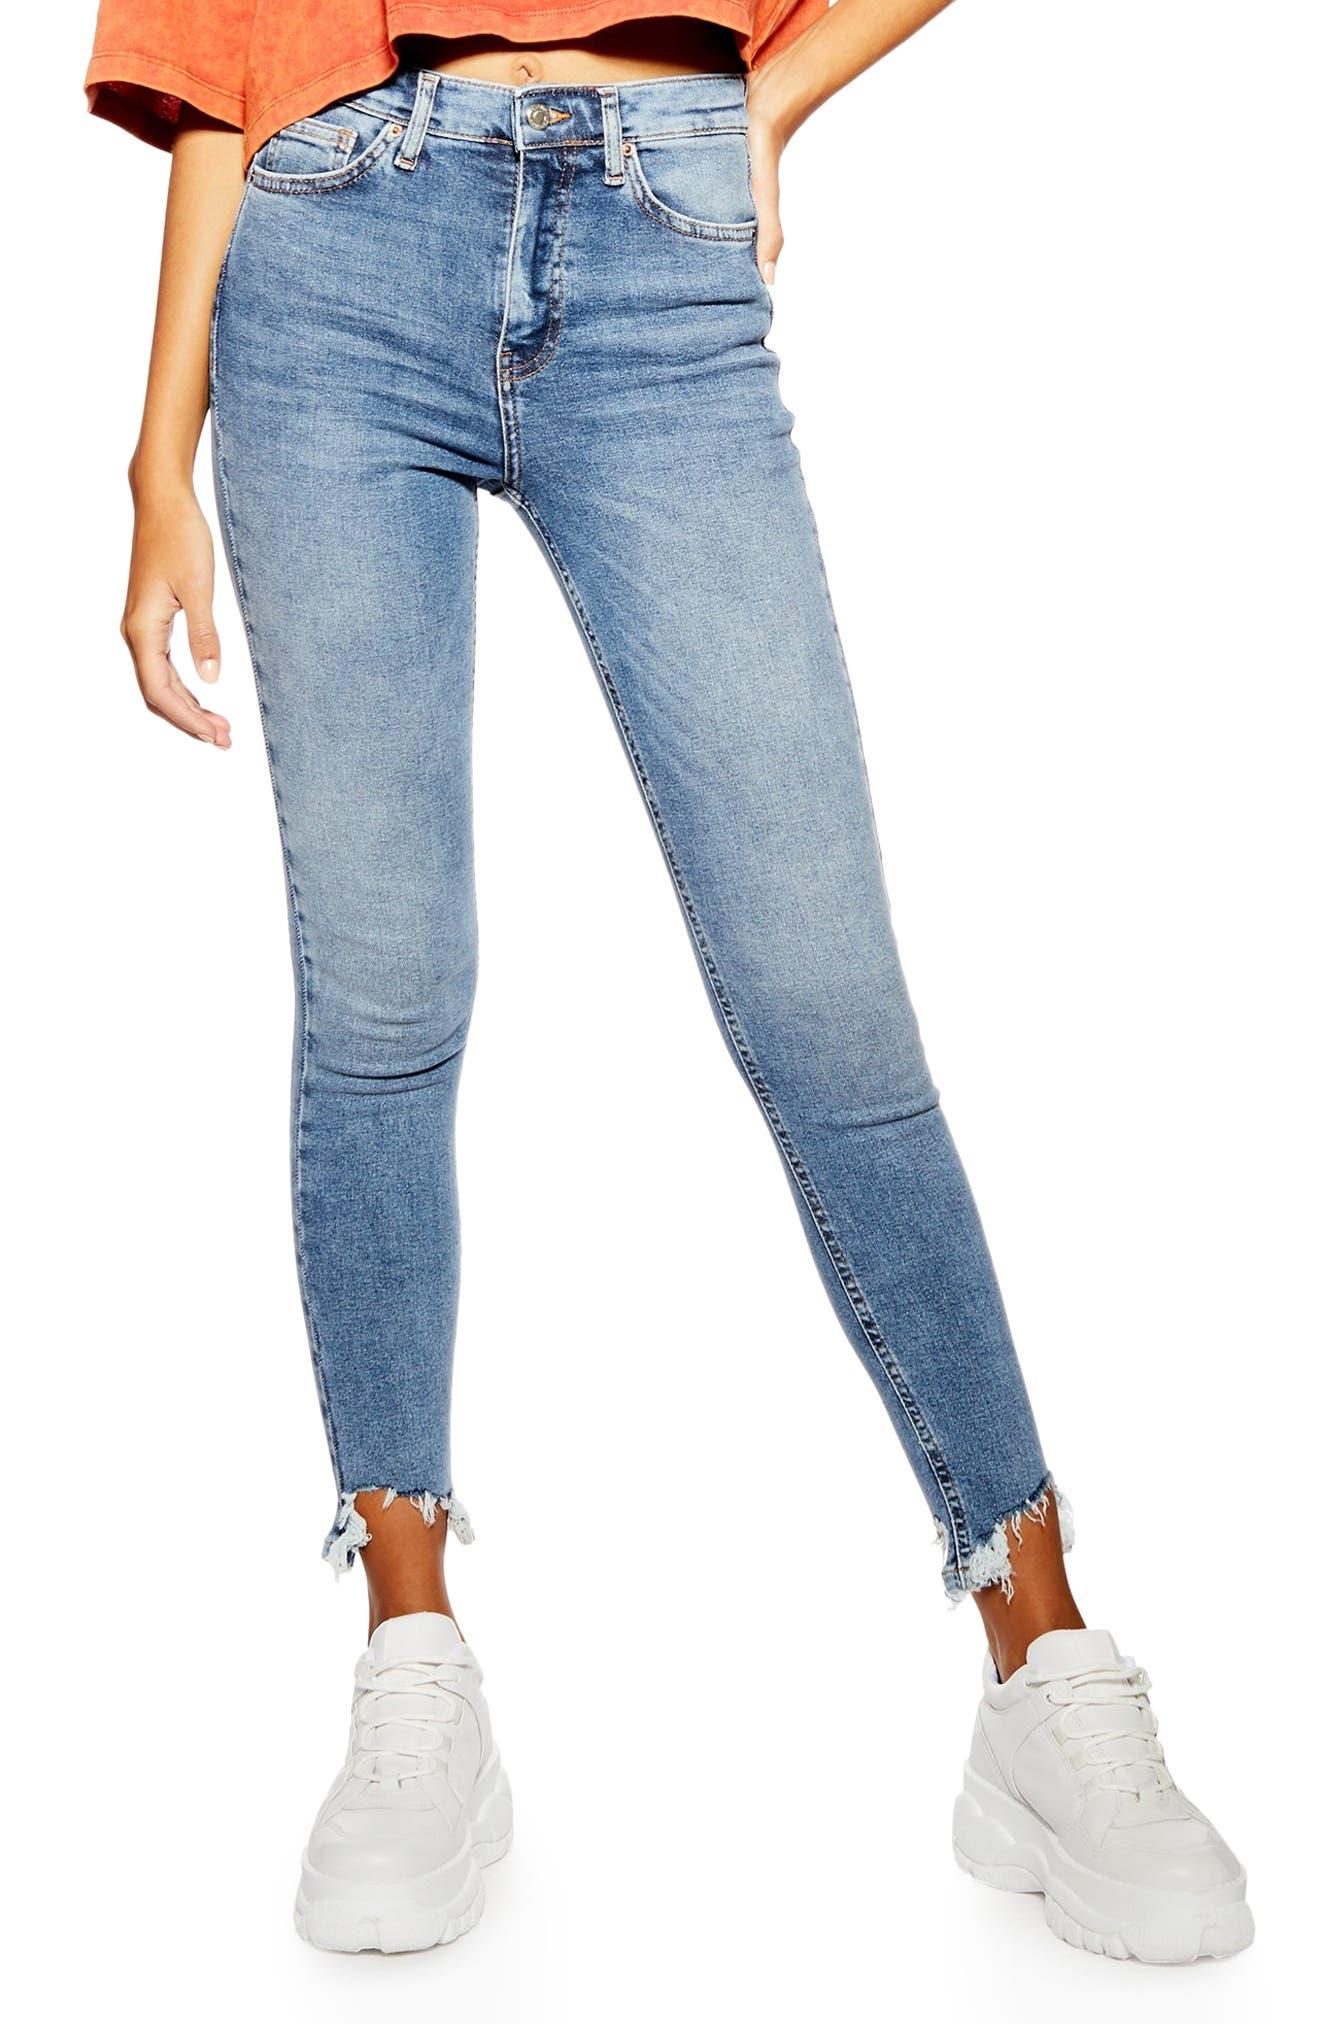 Topshop Jamie Jagged Hem Jeans (Regular & Petite)